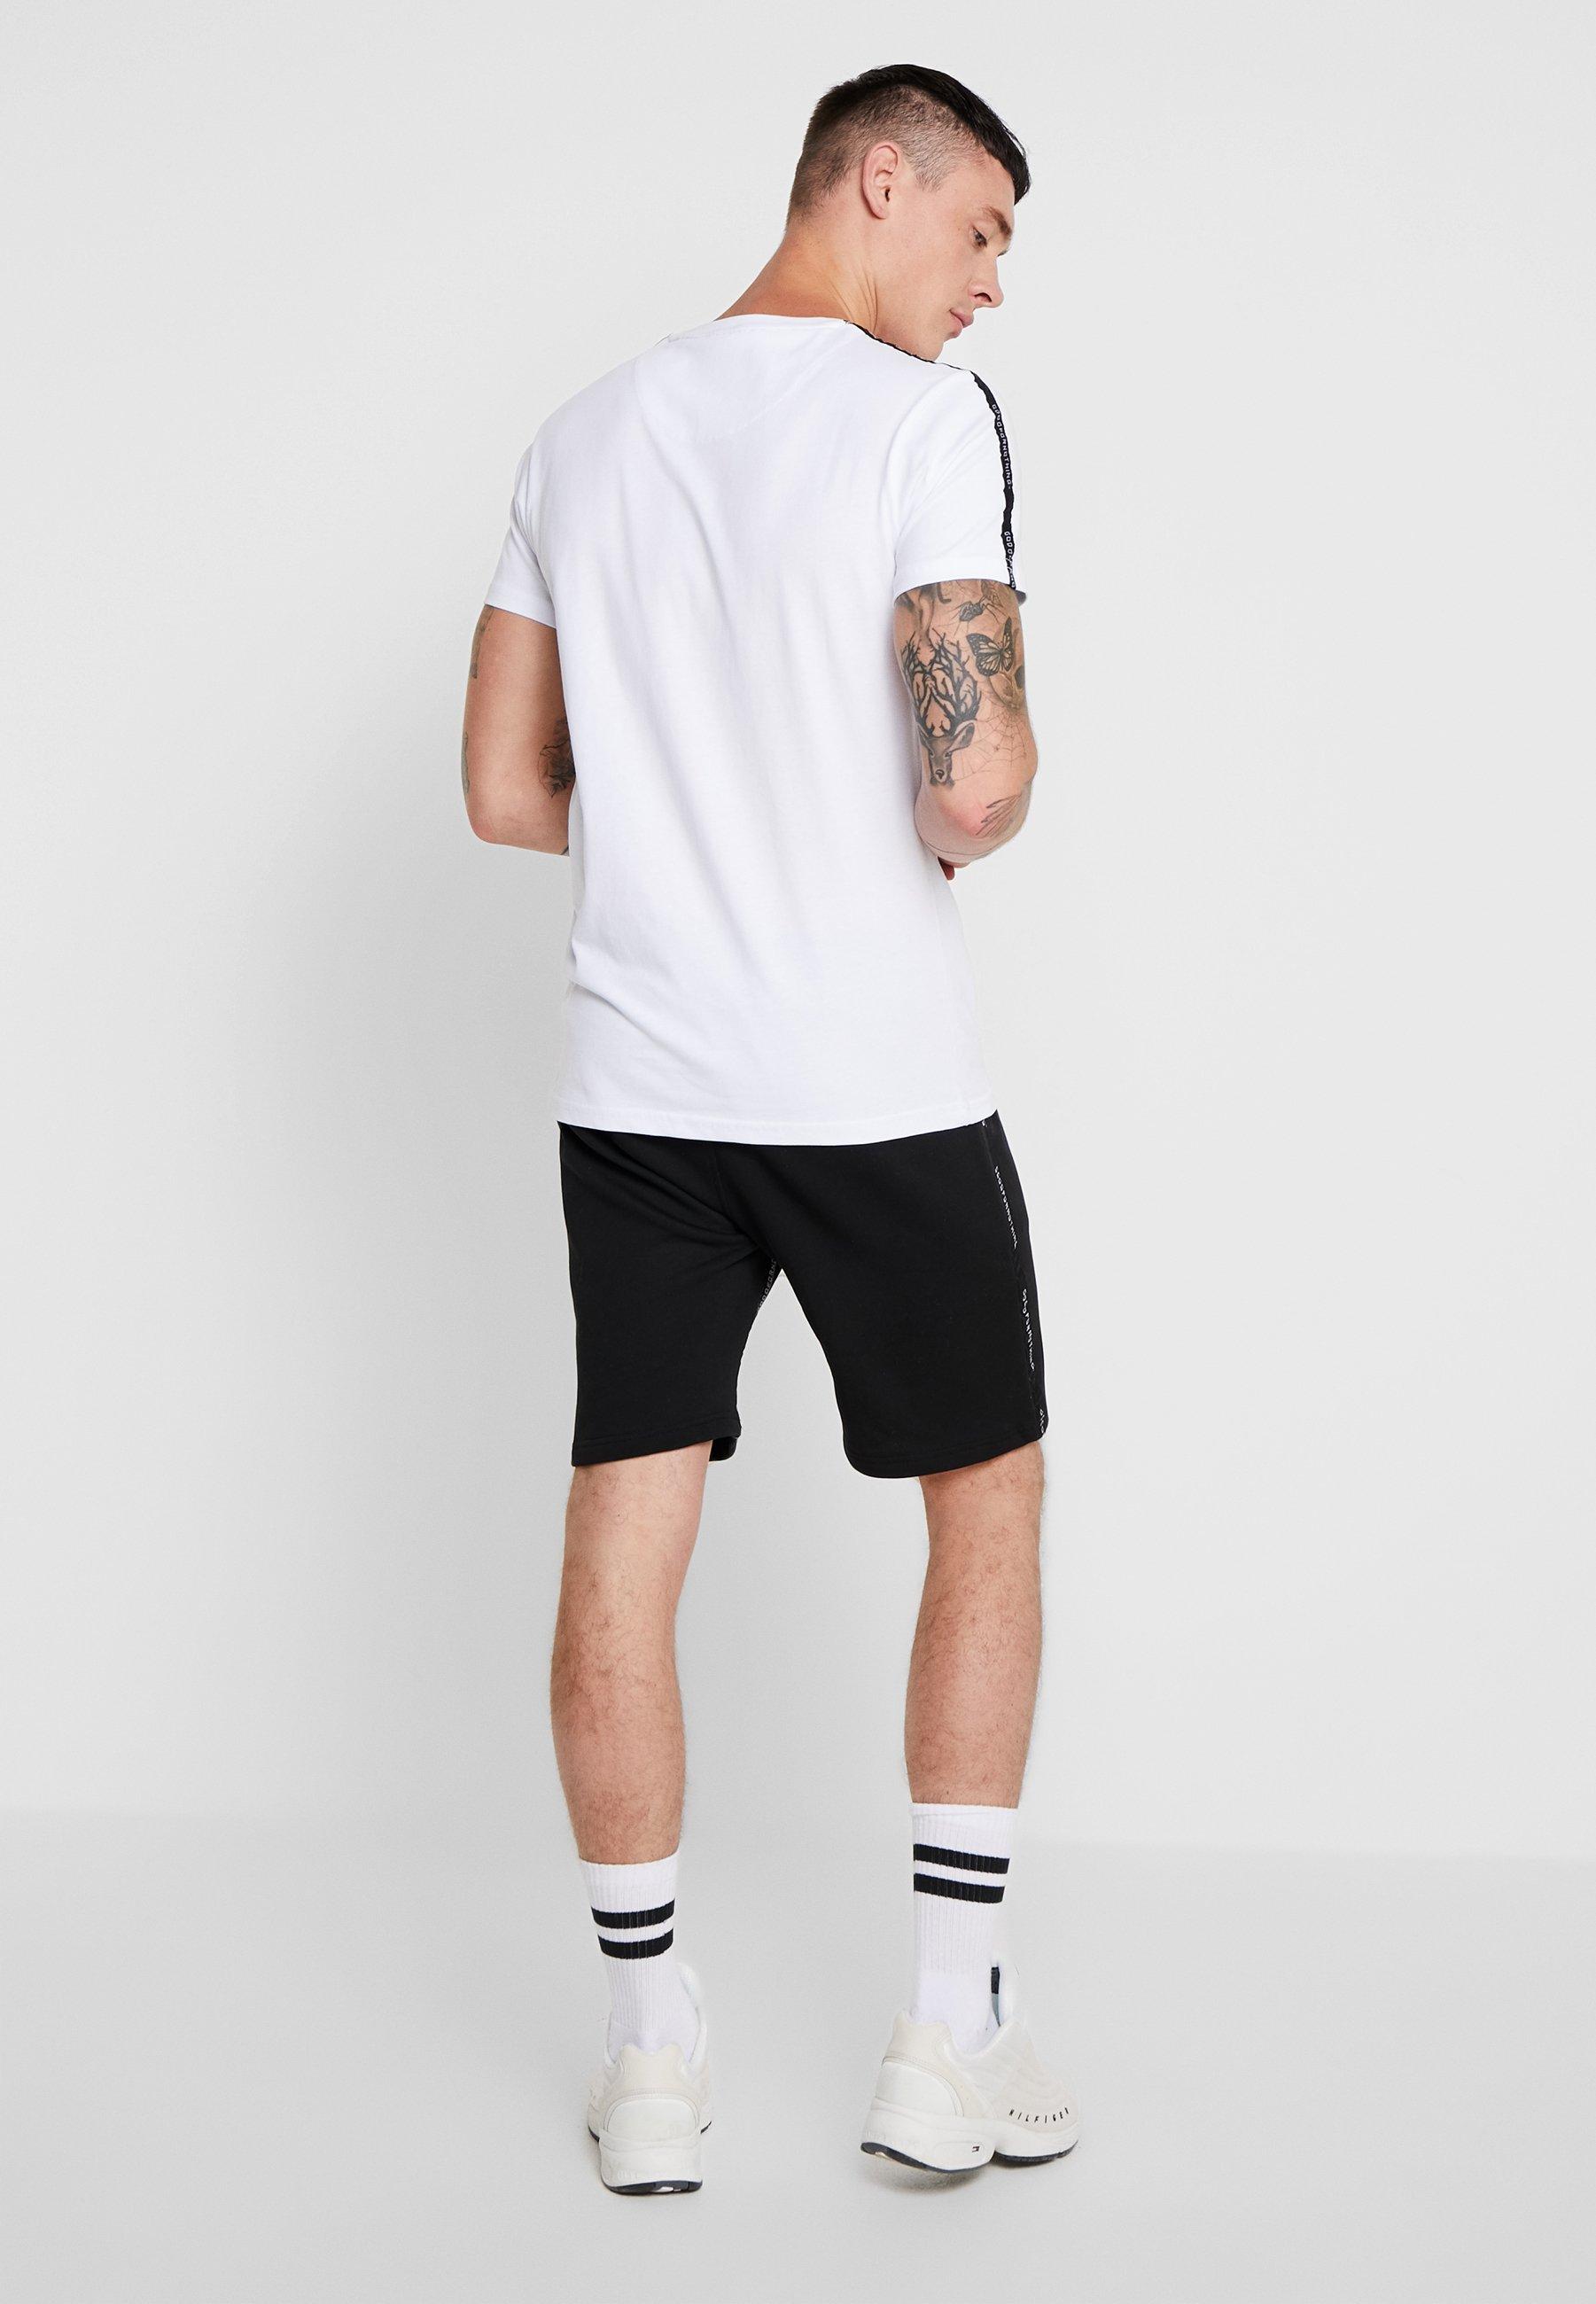 FutureT Good For Nothing Imprimé shirt White thxCQrdsB